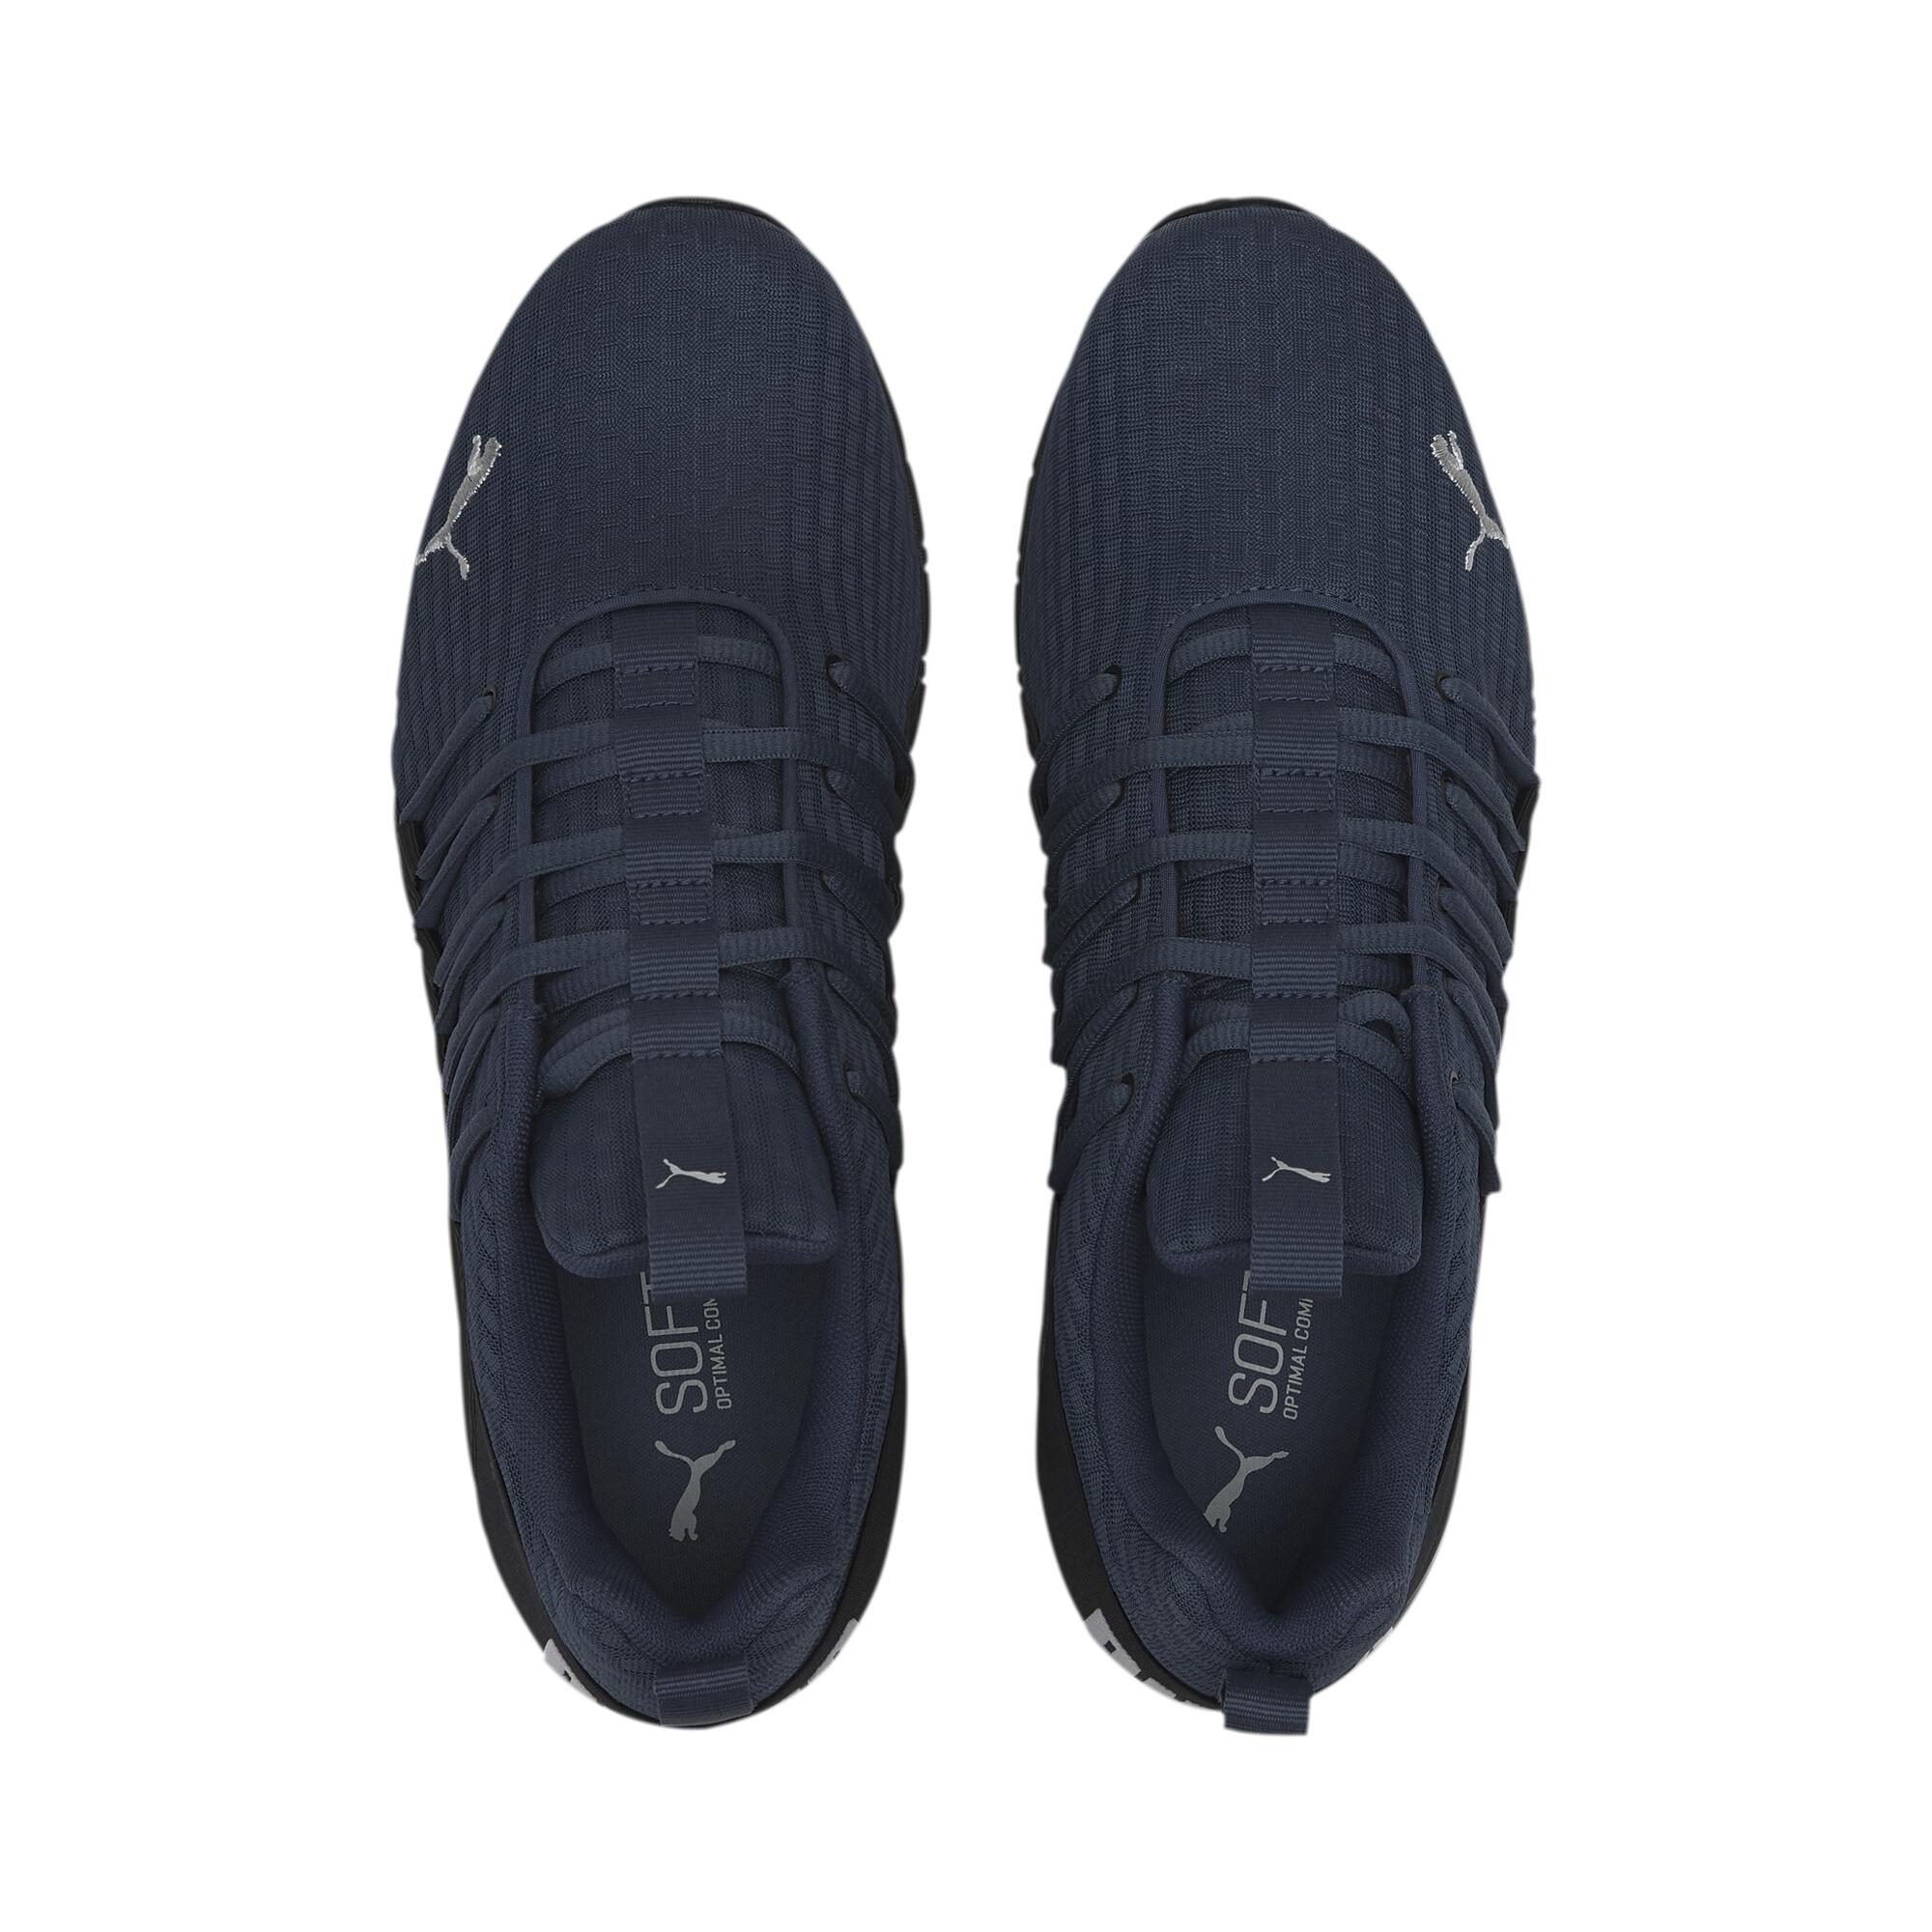 PUMA-Men-039-s-Axelion-Block-Running-Shoes thumbnail 8